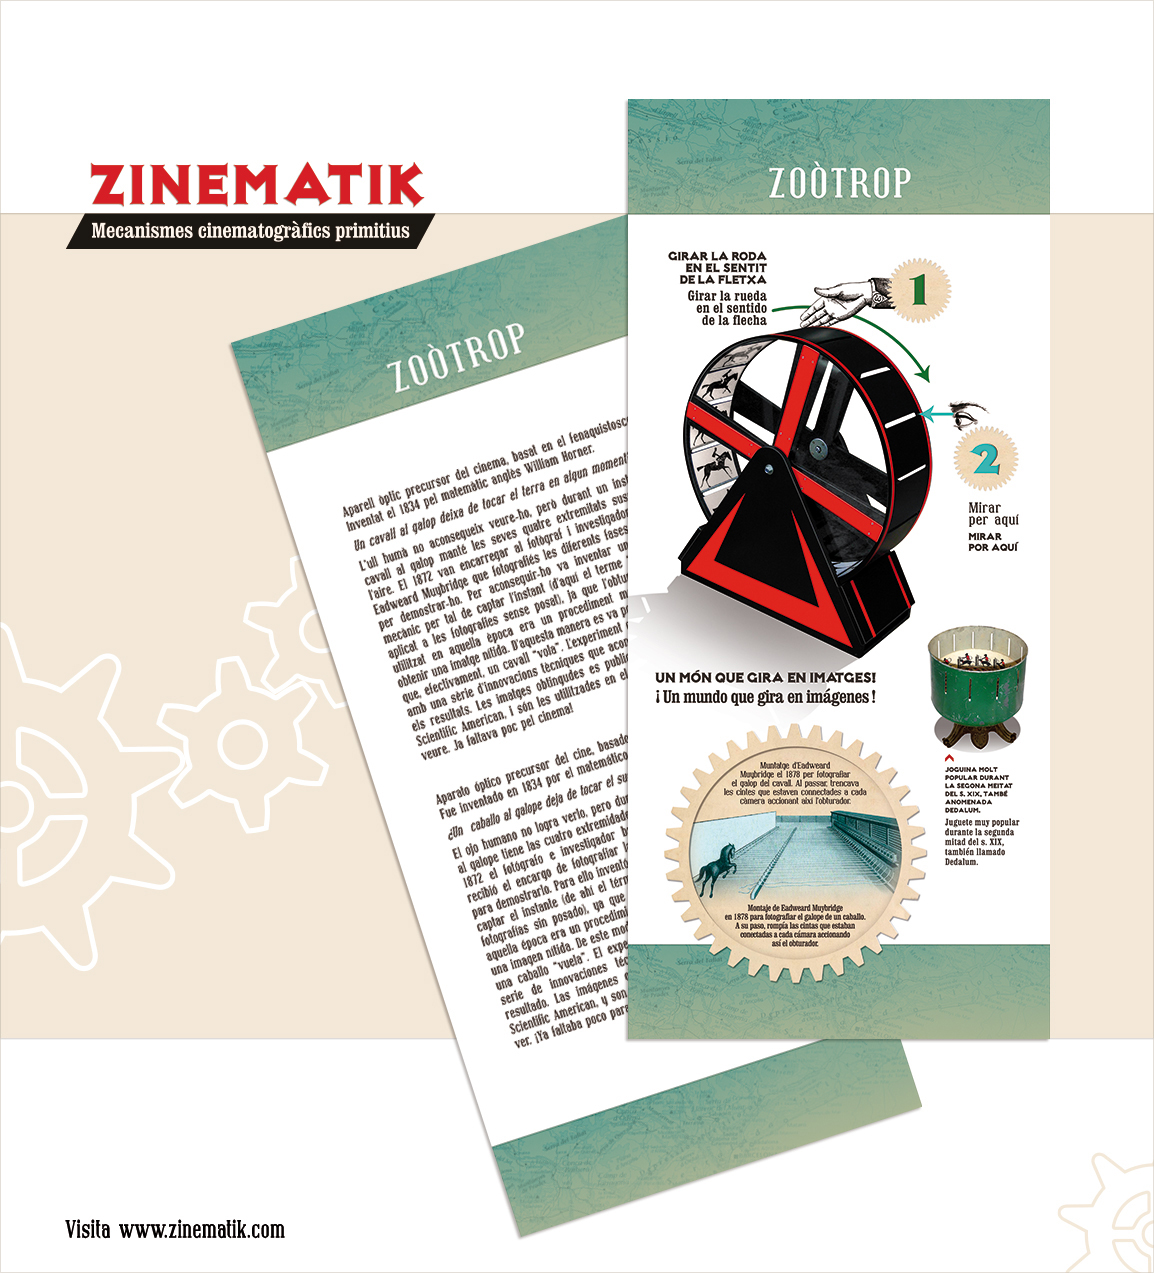 Zinematik Tarjeta de visita Banners explicativos ilustracion